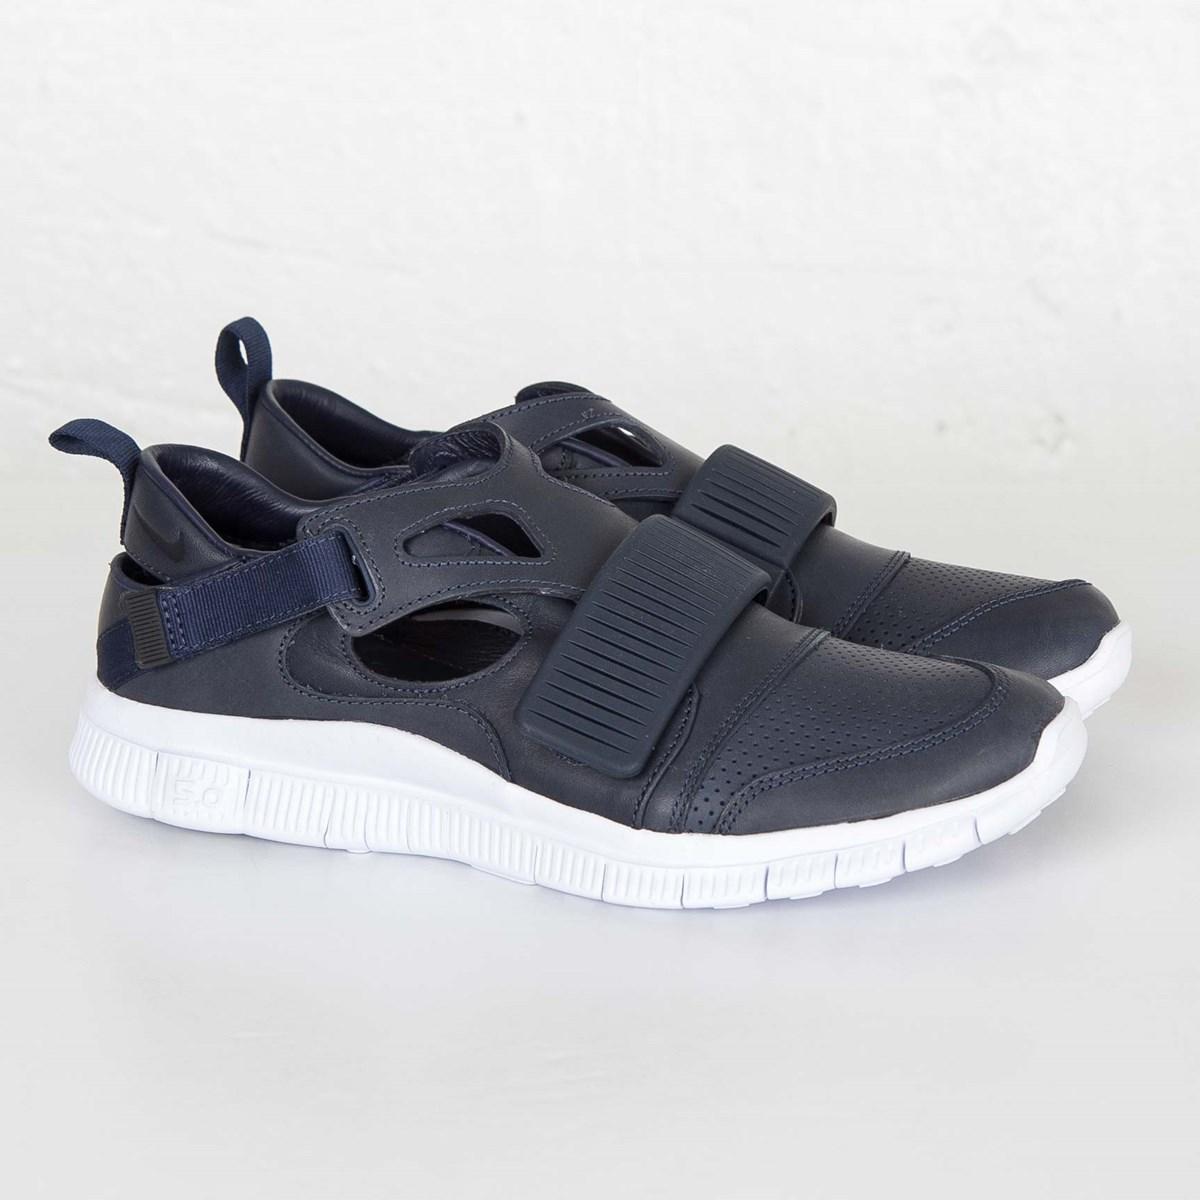 013b04d94b38 Nike Free Huarache Carnivore SP - 801759-413 - Sneakersnstuff ...